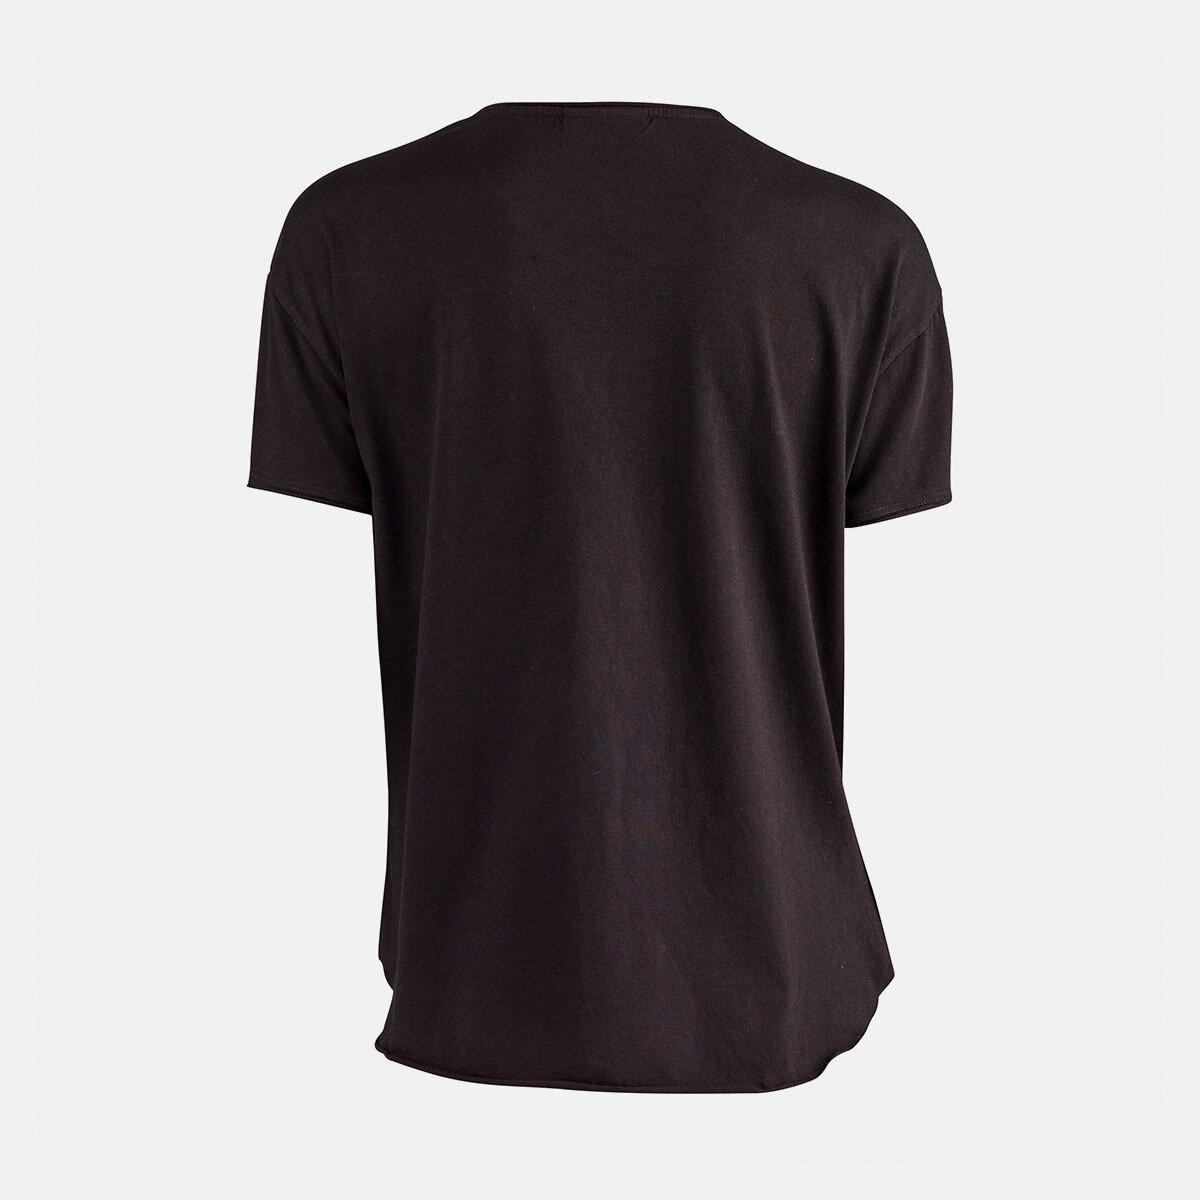 TEES BLACK Woman T-Shirts